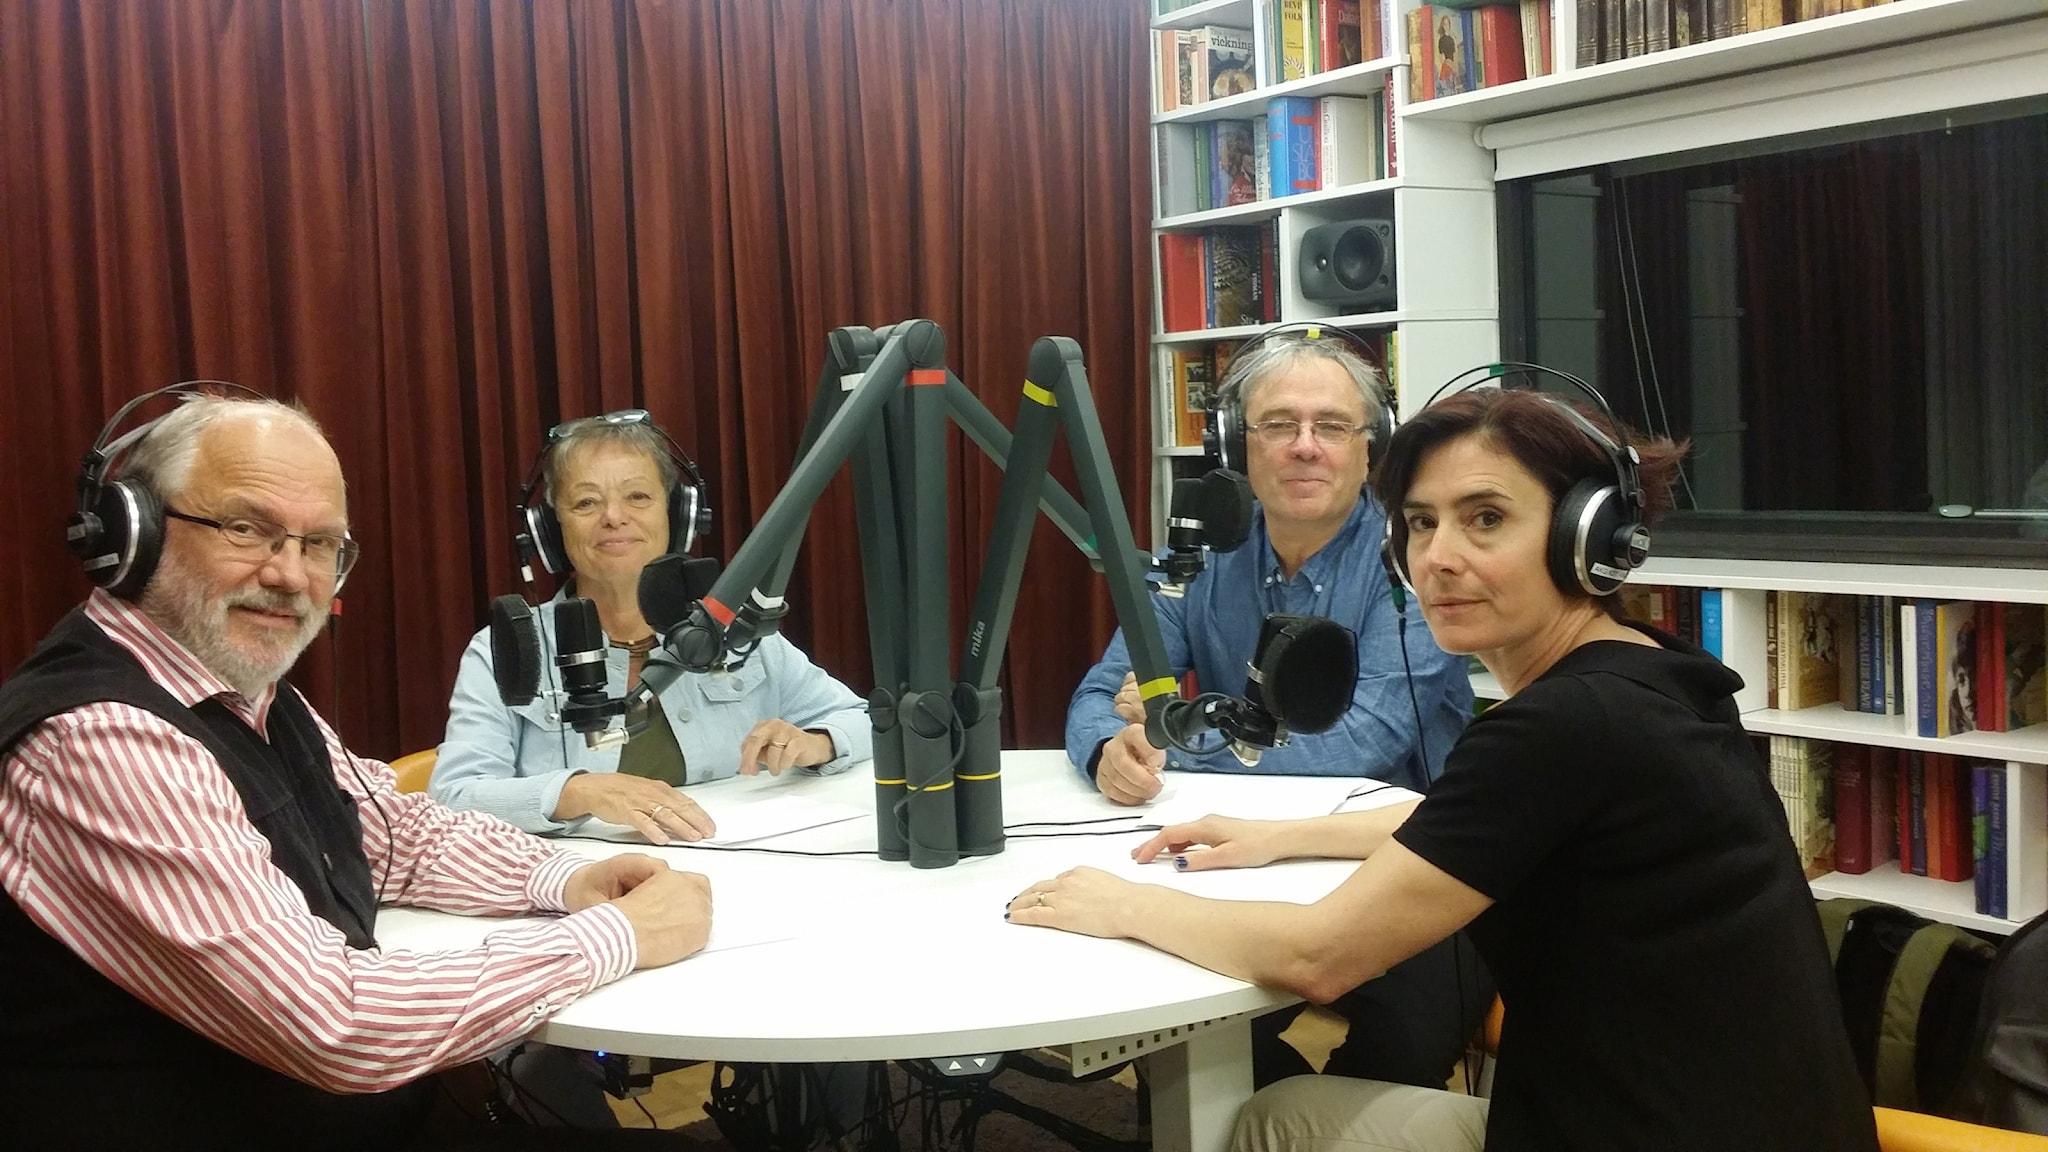 Stefan Bohman, Kathinka Lindhe, Dan Lundberg och Karin Strand. Foto: David Rune/SR